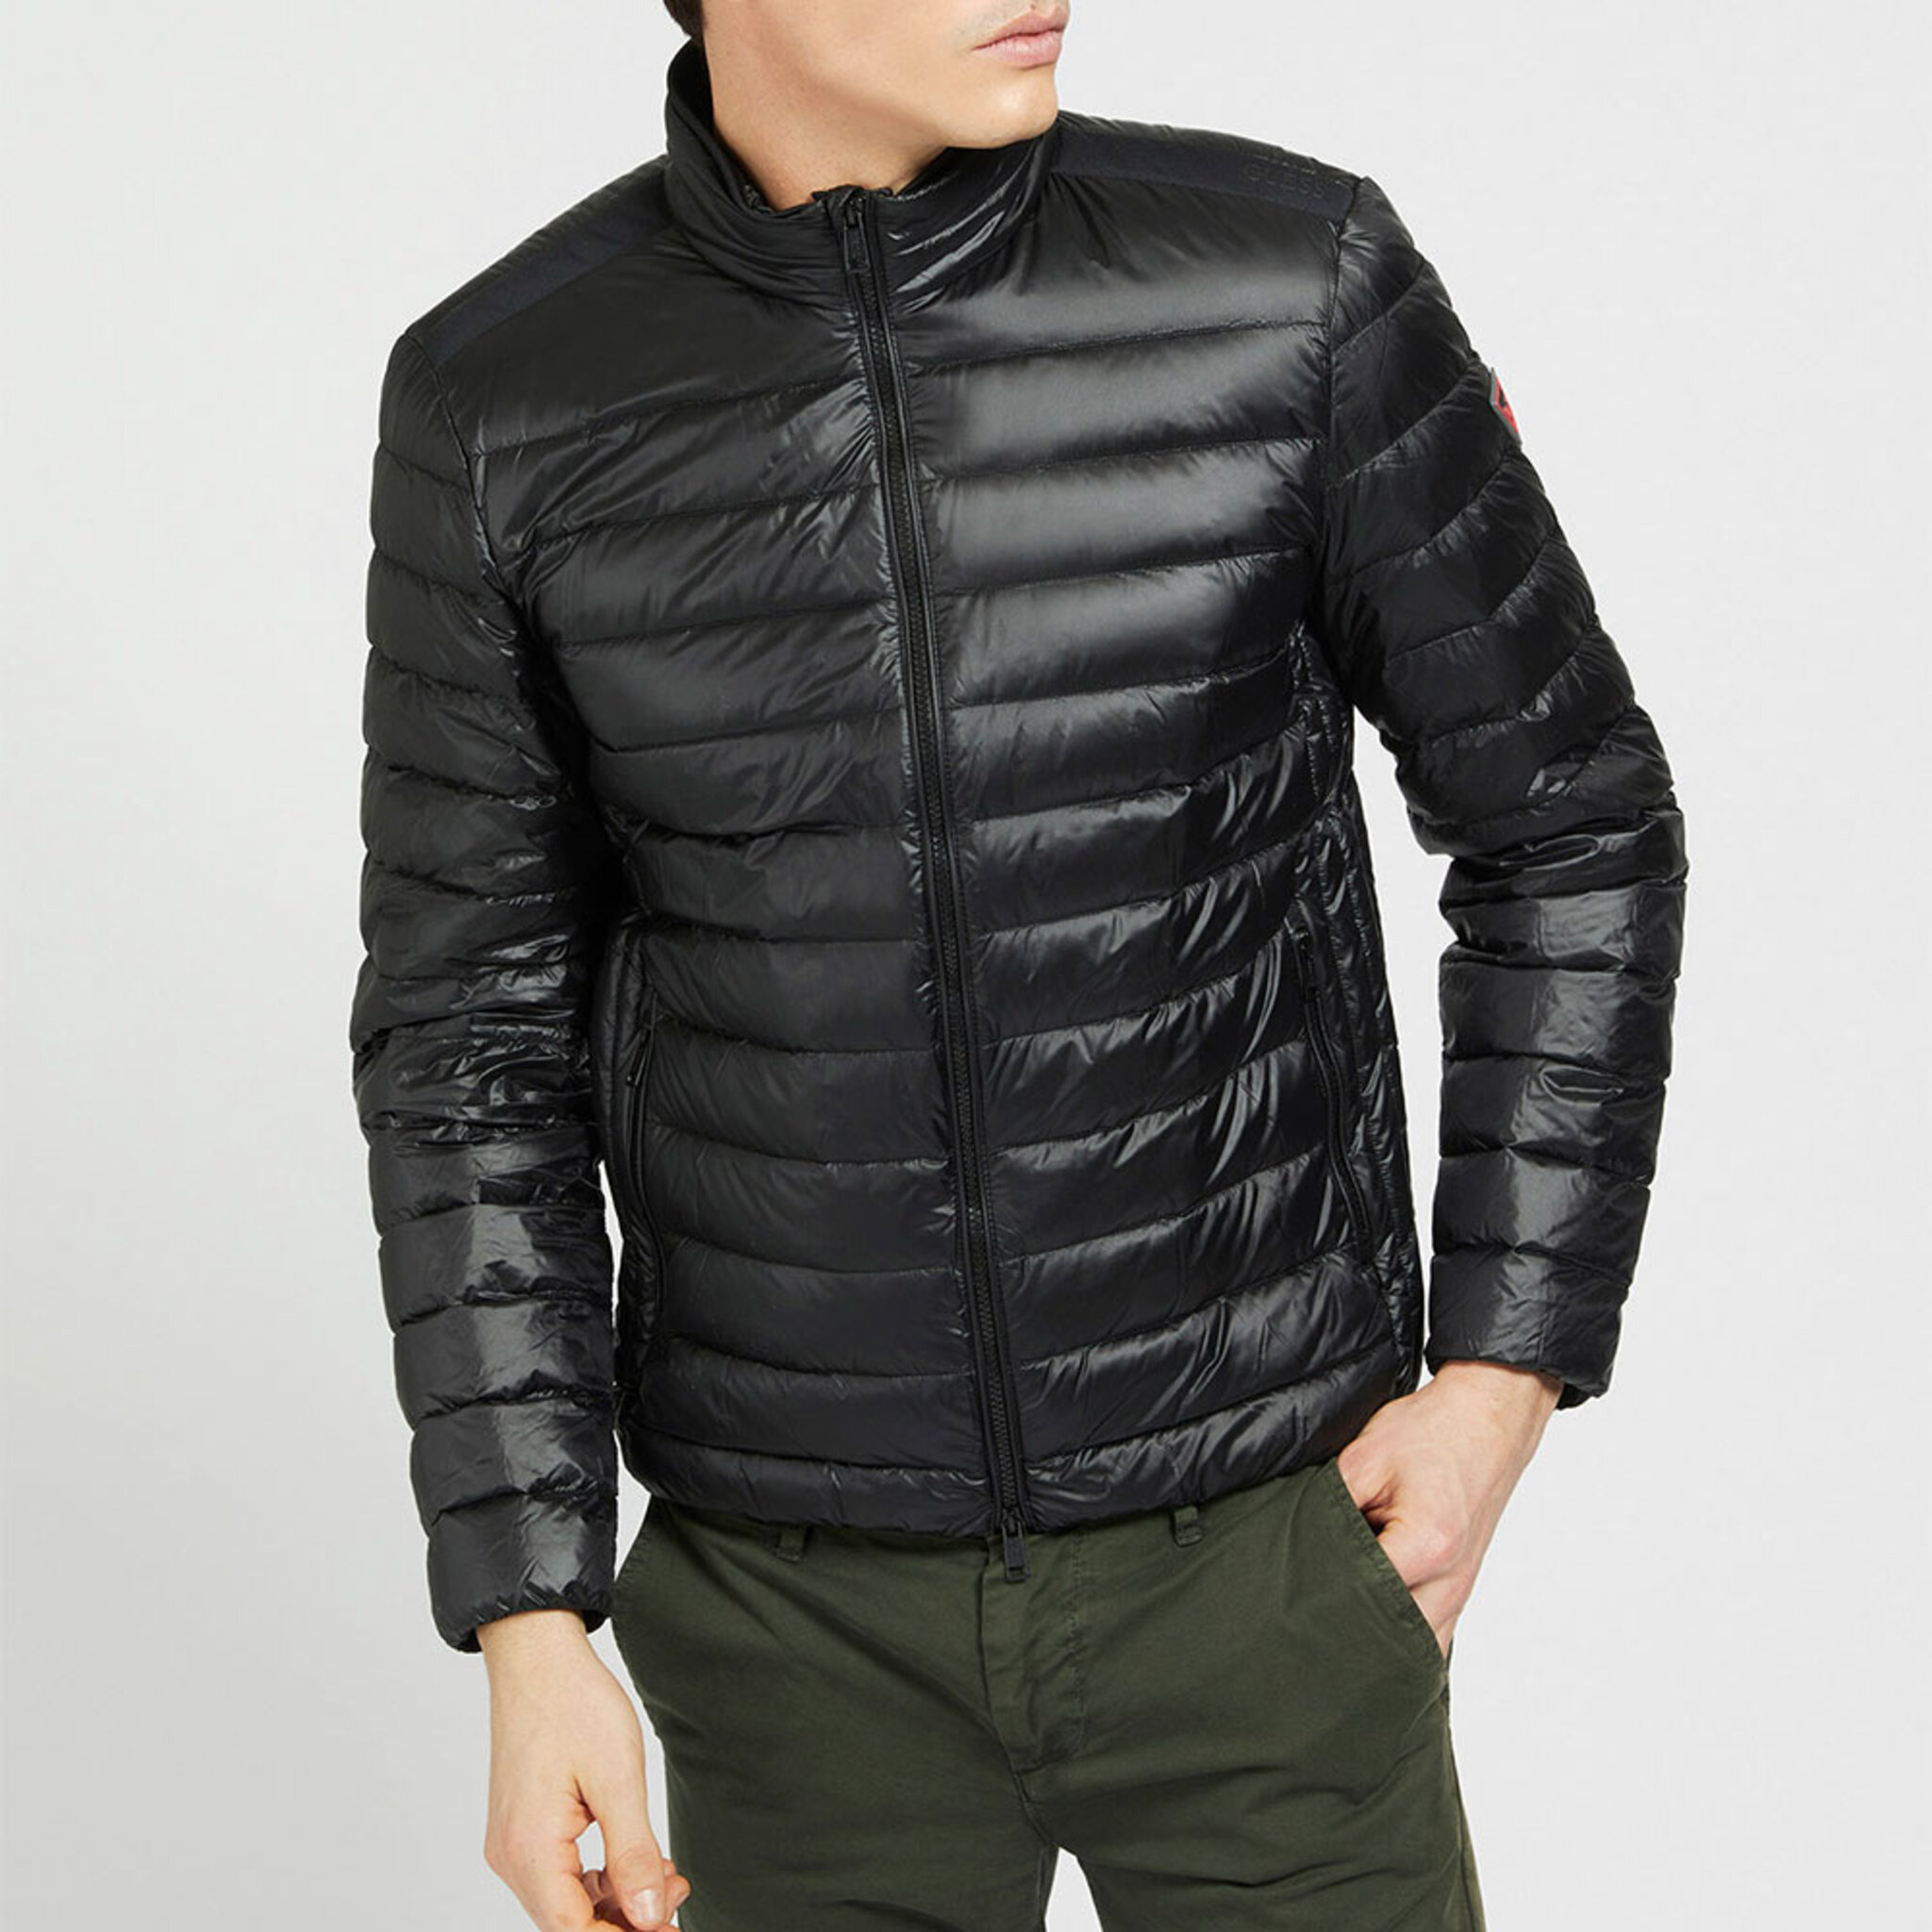 LIGHT PACKABLE REALD Jacket